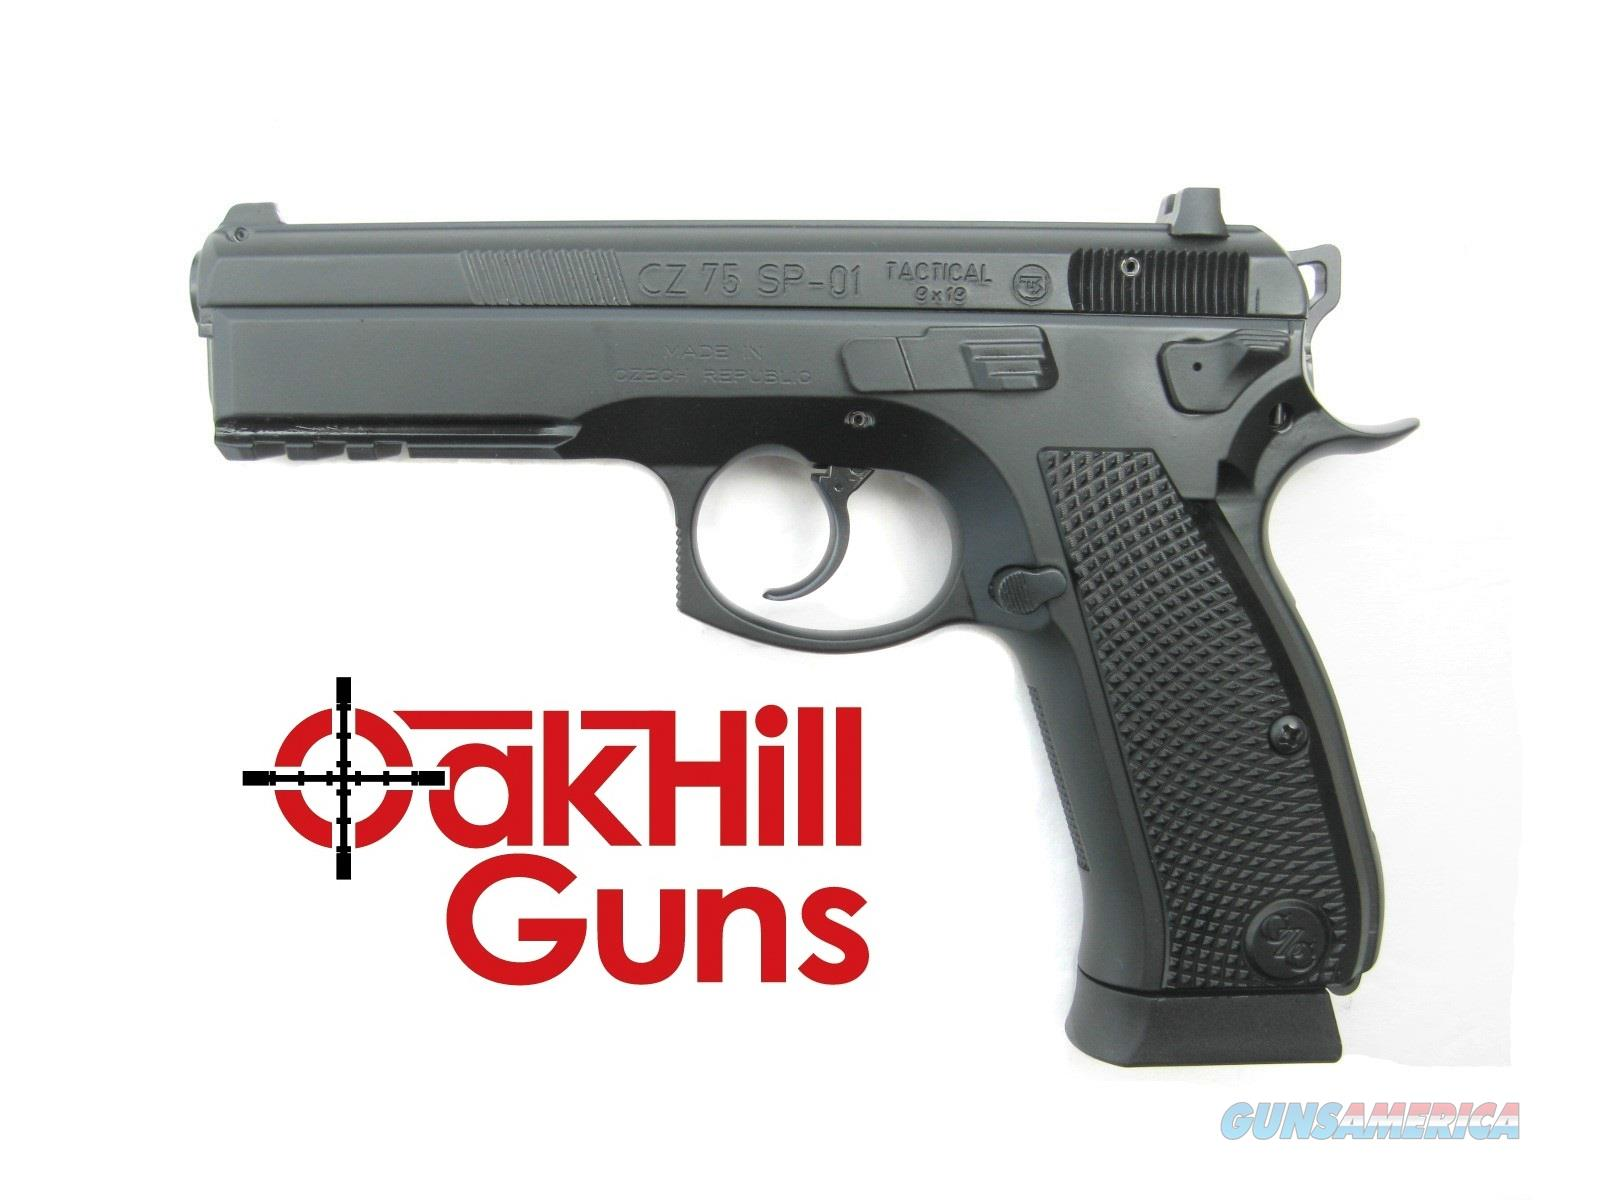 CZ 75 SP-01 Tactical 9mm CZ Custom Tuned Decocker 18 rd 99104 *NEW*  Guns > Pistols > CZ Pistols